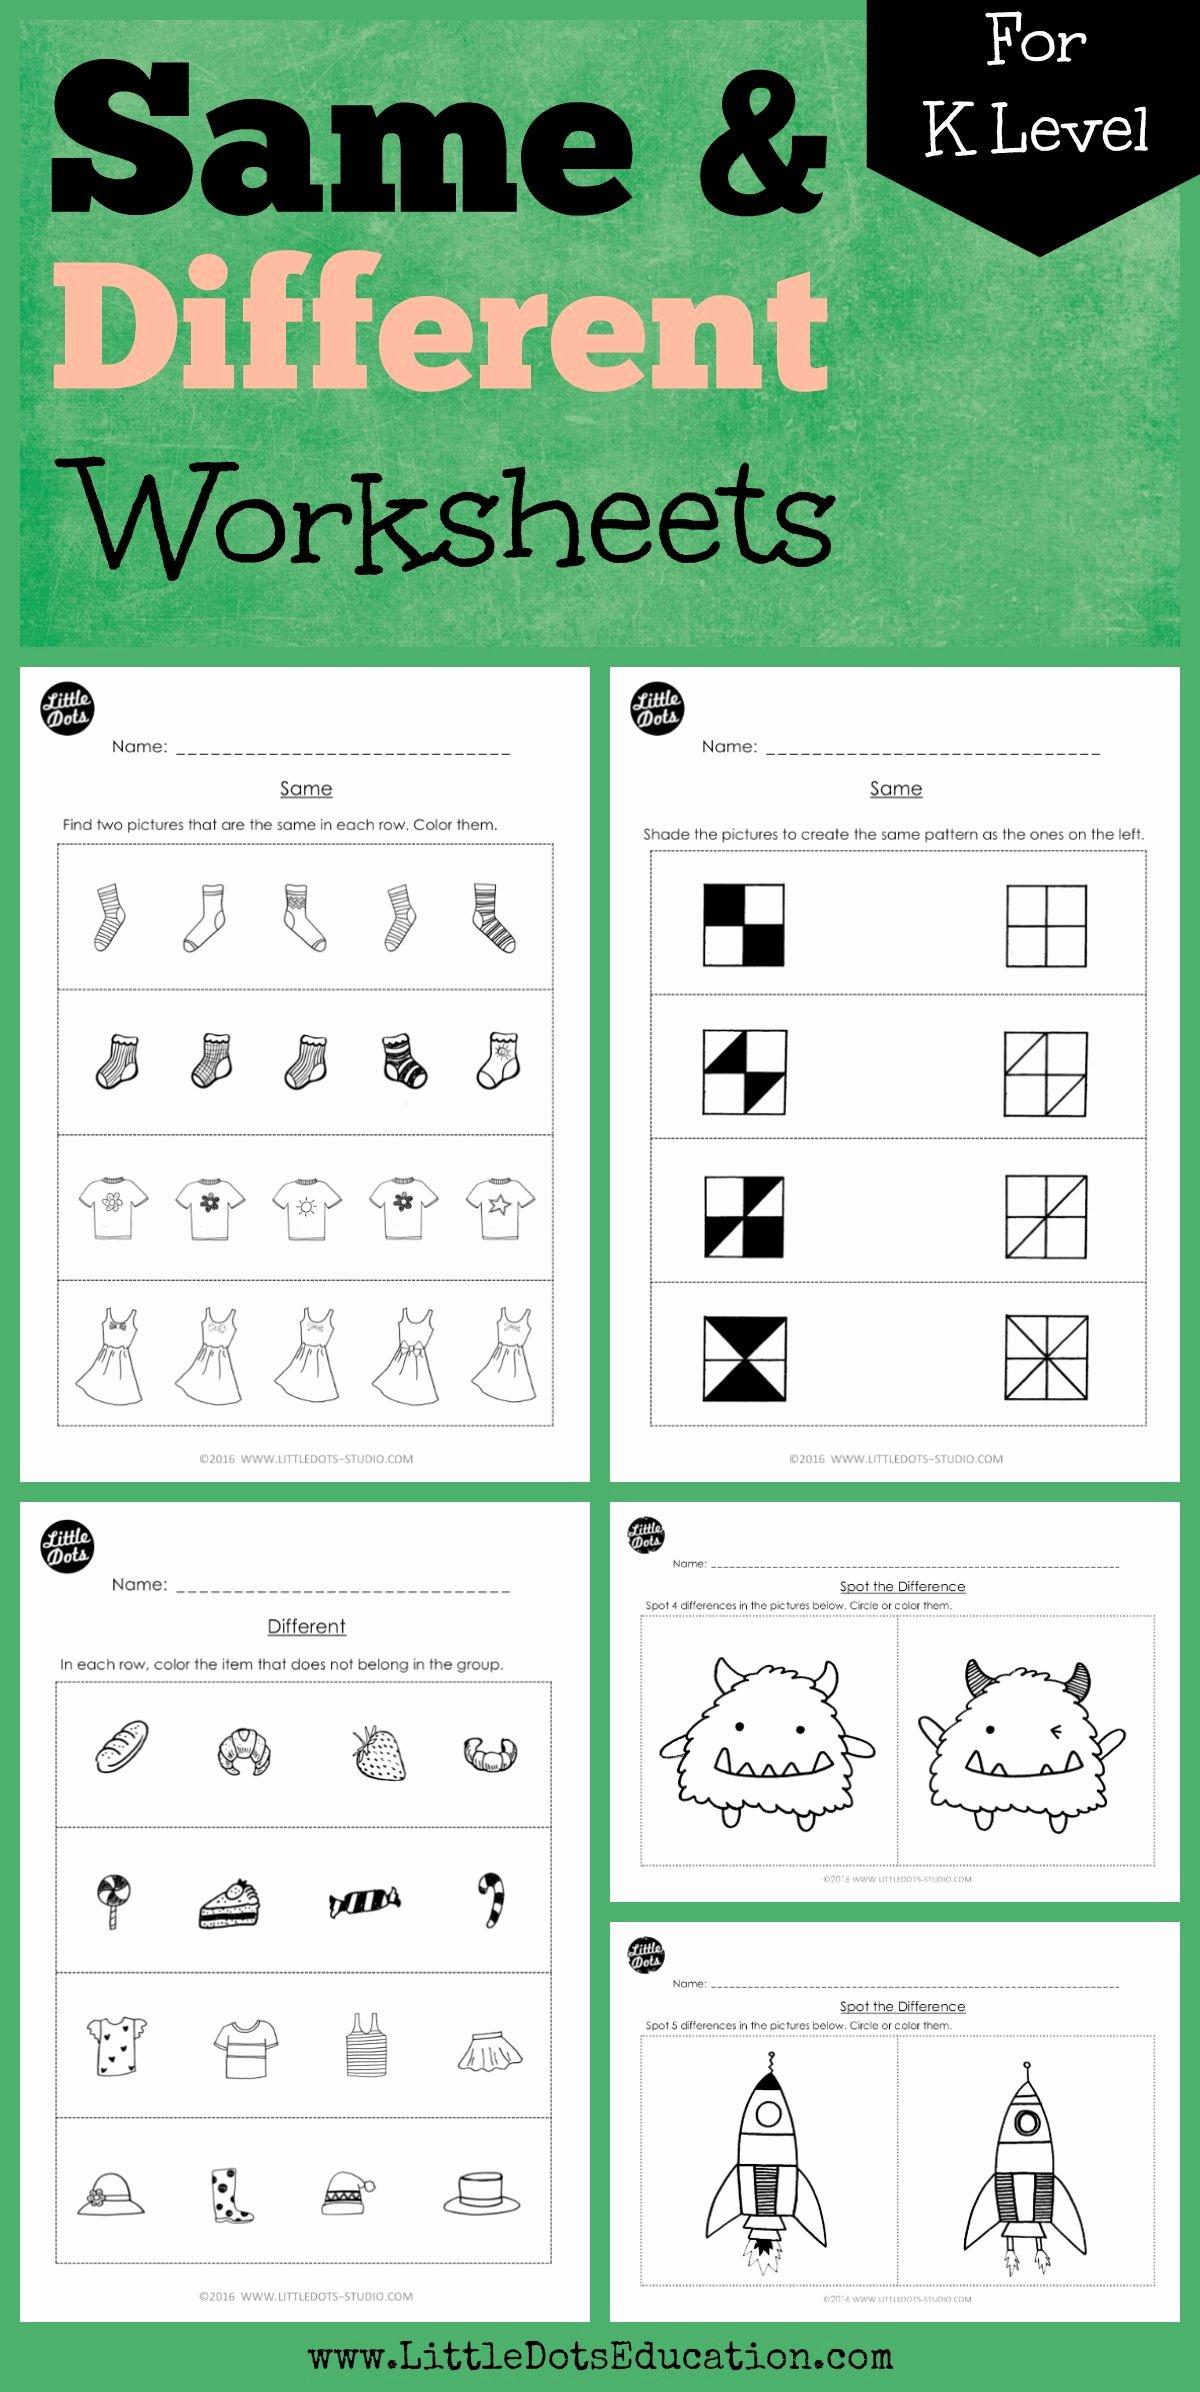 Math Concept Worksheets for Preschoolers Best Of Kindergarten Same and Different Worksheets and Activities